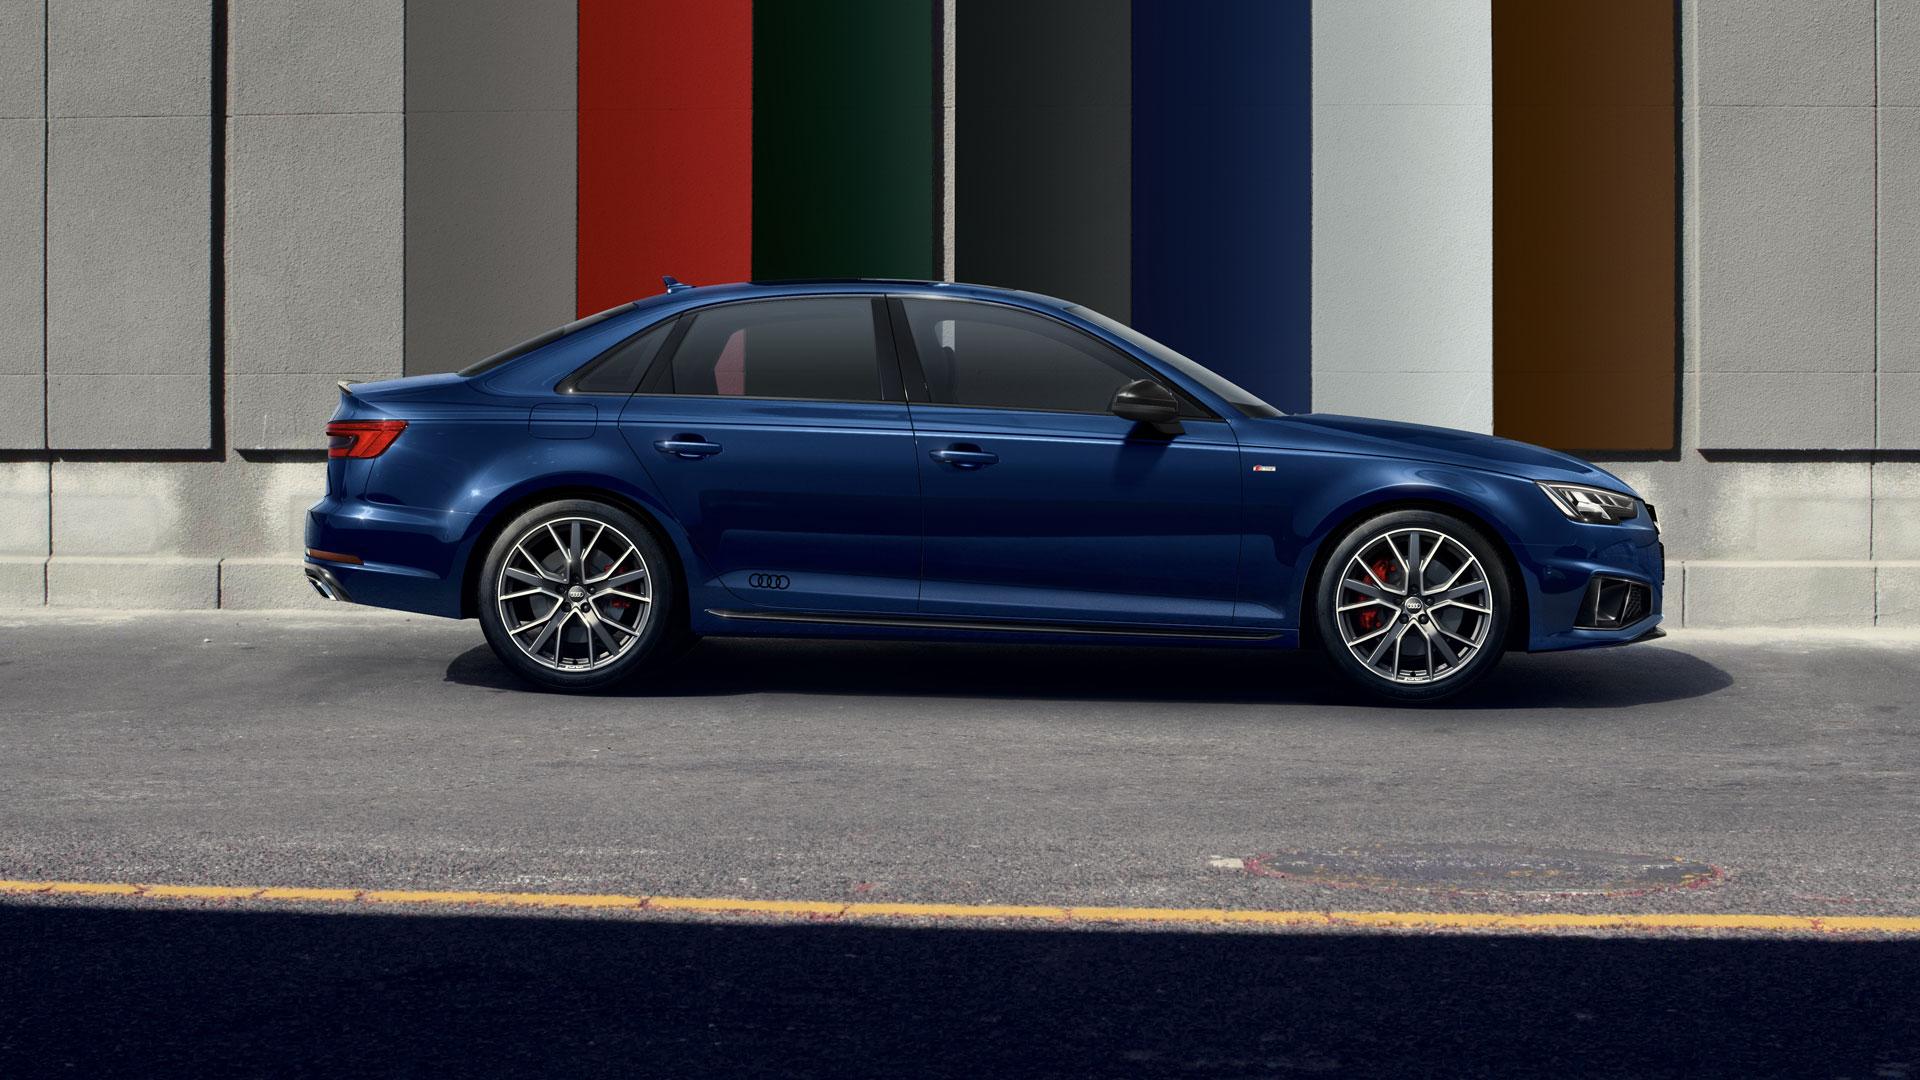 All New Audi A4l A4 Faw Volkswagen Audi Vorsprung Durch Technik